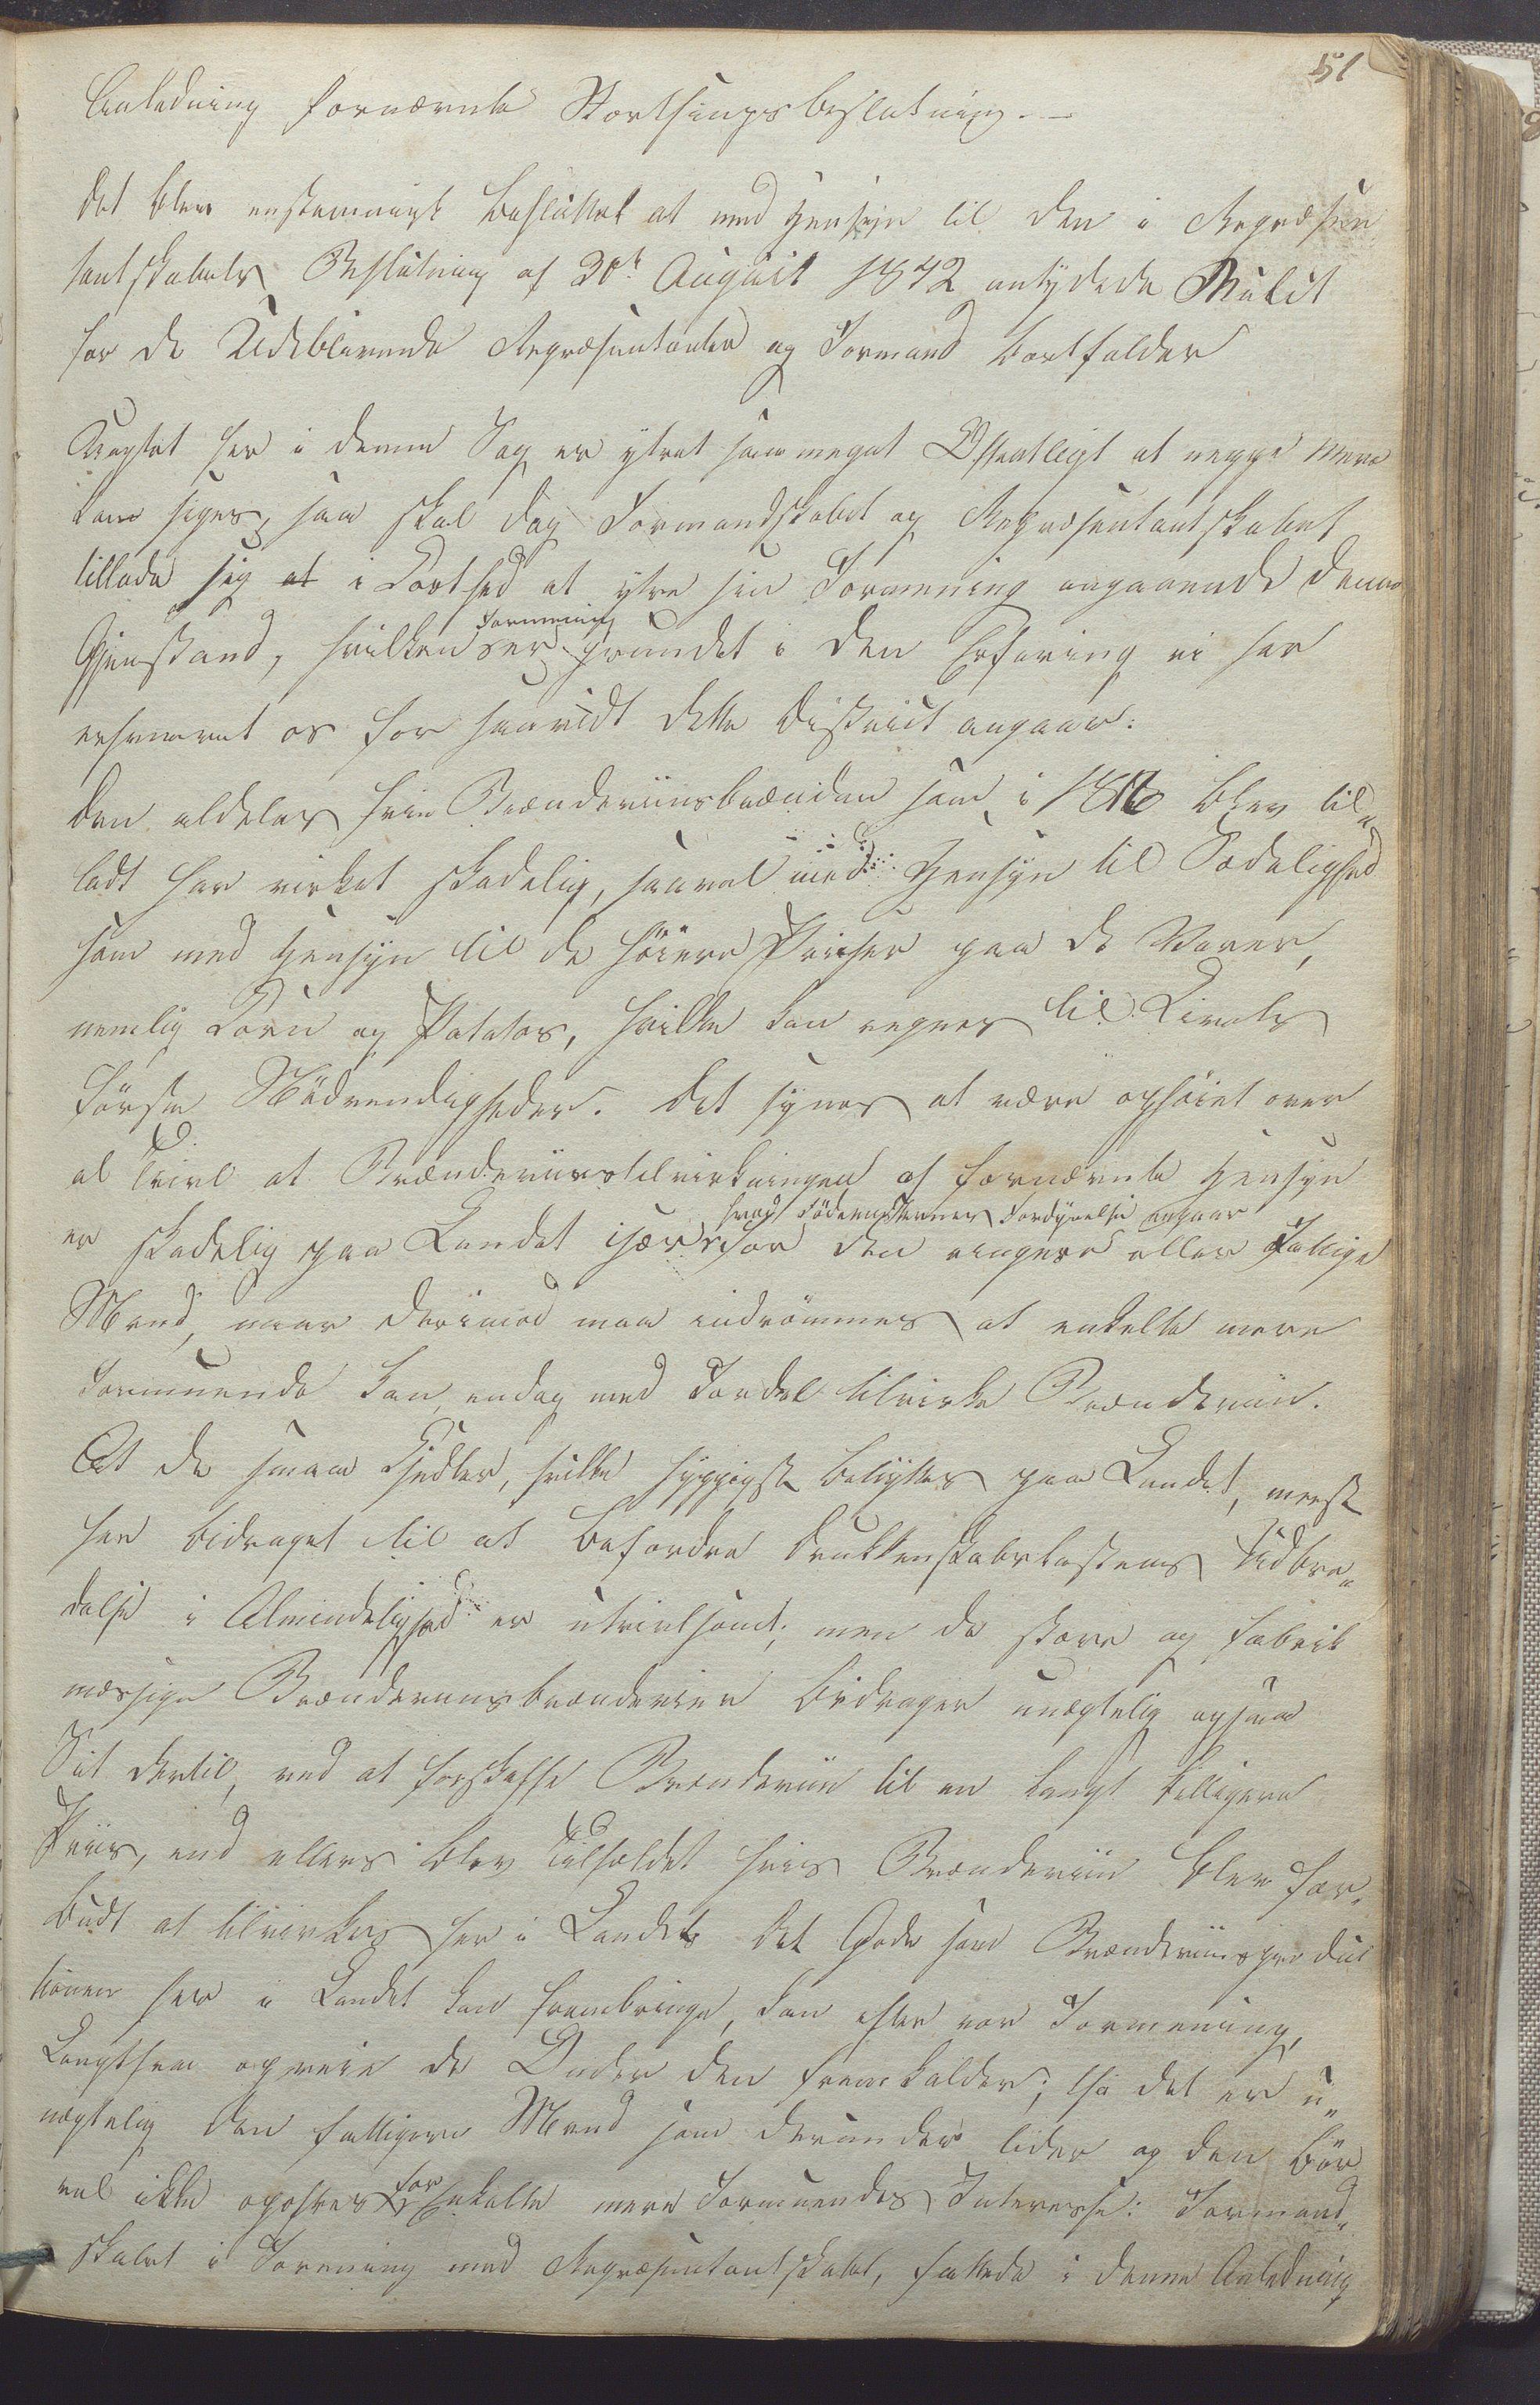 IKAR, Suldal kommune - Formannskapet/Rådmannen, A/Aa/L0001: Møtebok, 1837-1876, s. 51a